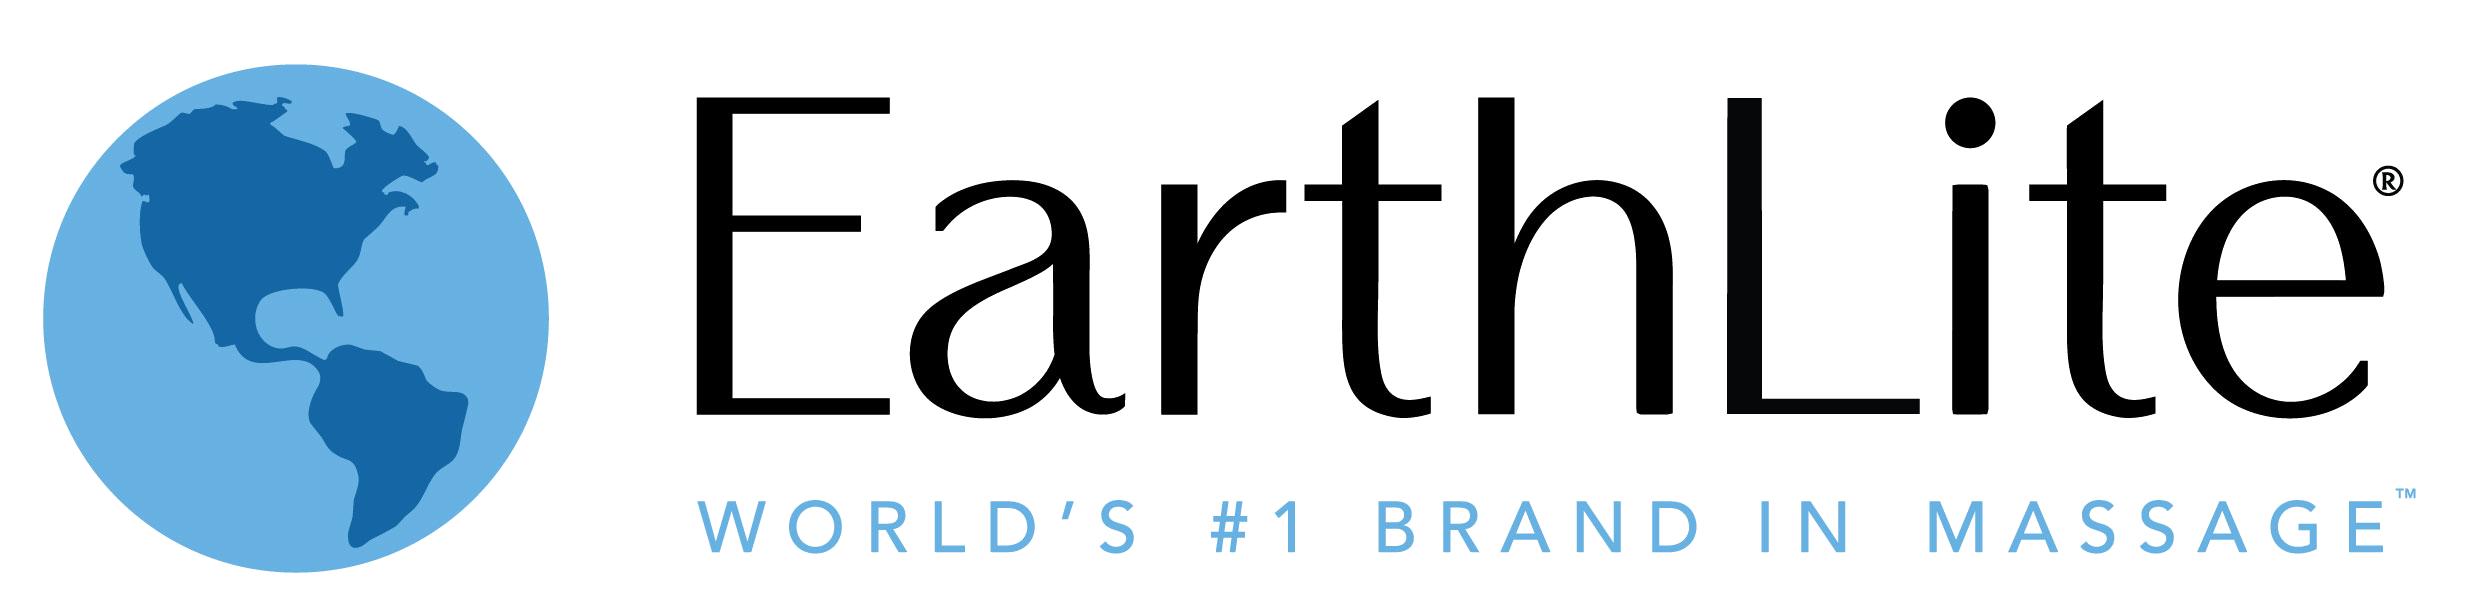 Earthlite Table Brand Image